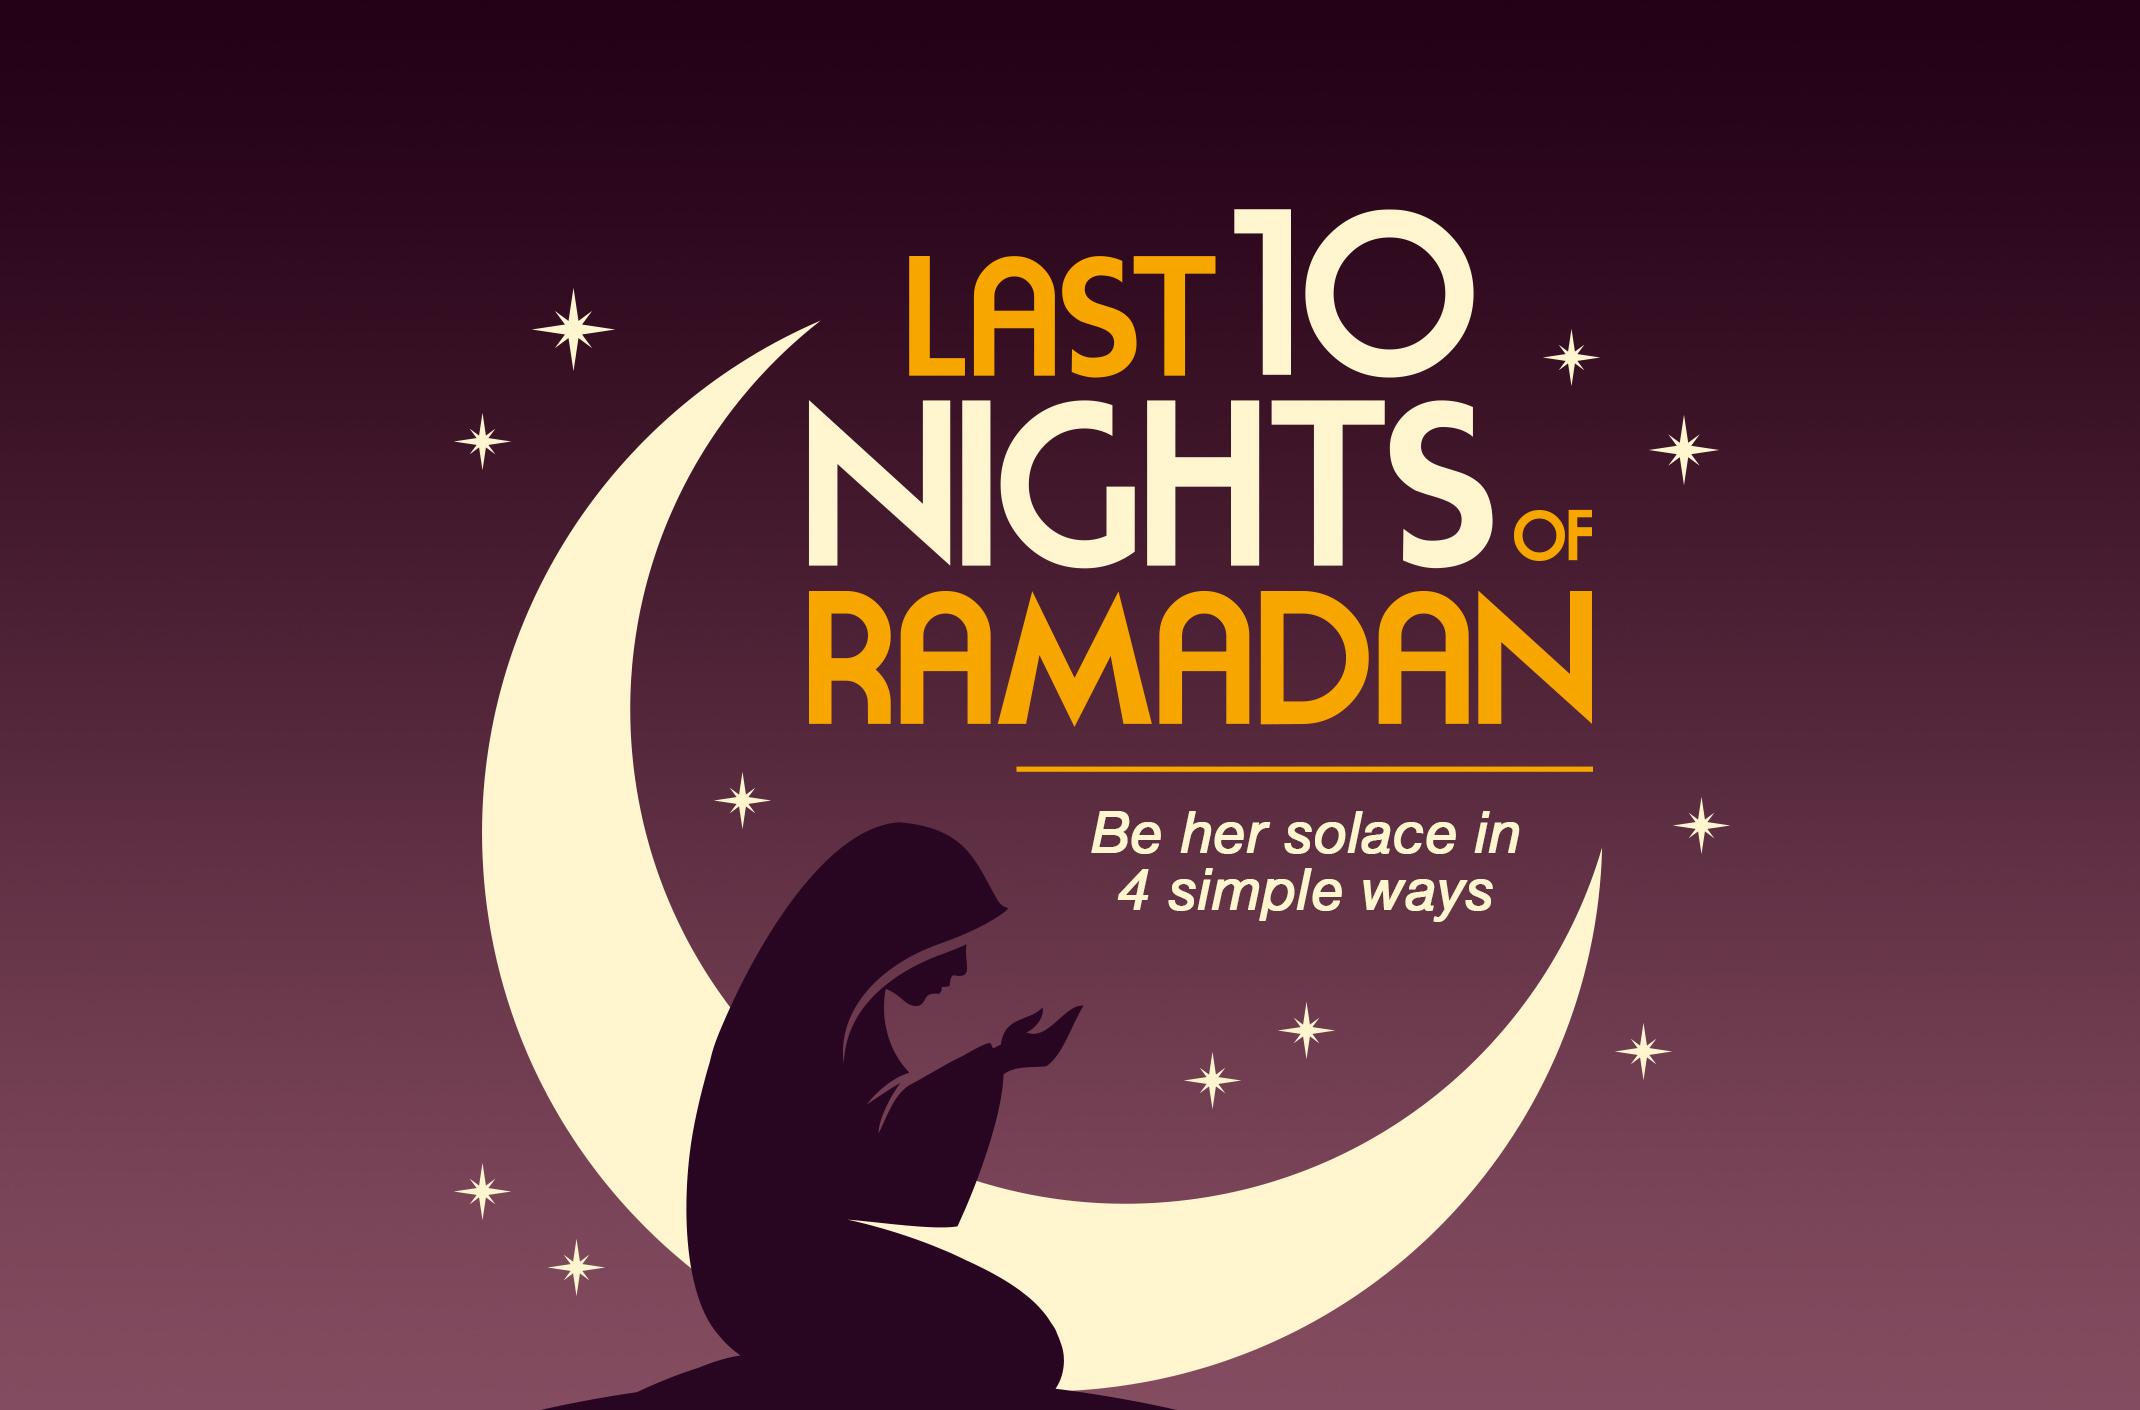 Giving Solace in Ramadan